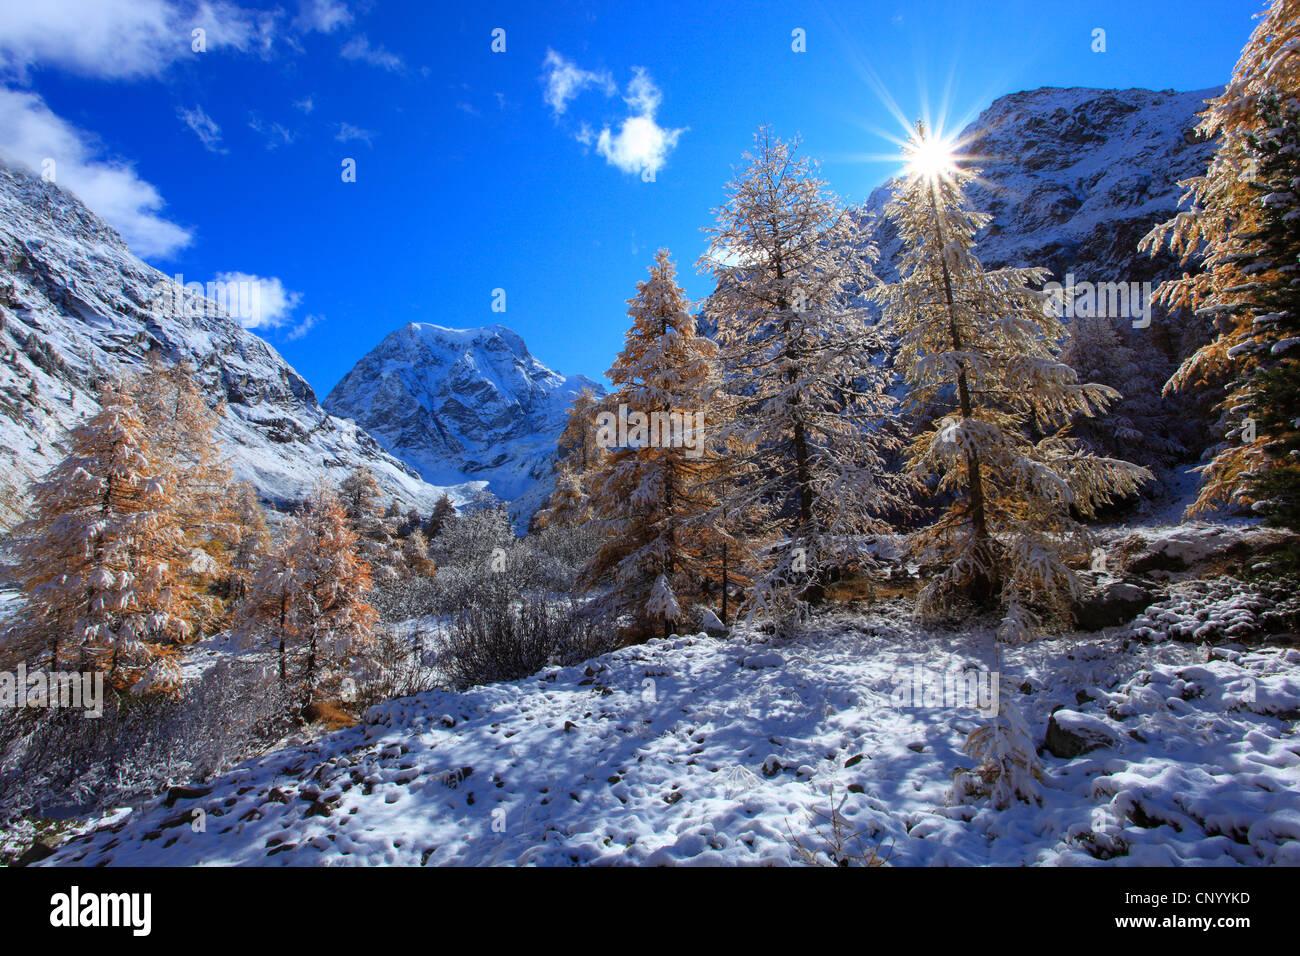 snowy mountain scenery with Mount Collon, Arolla valley, Switzerland, Valais - Stock Image